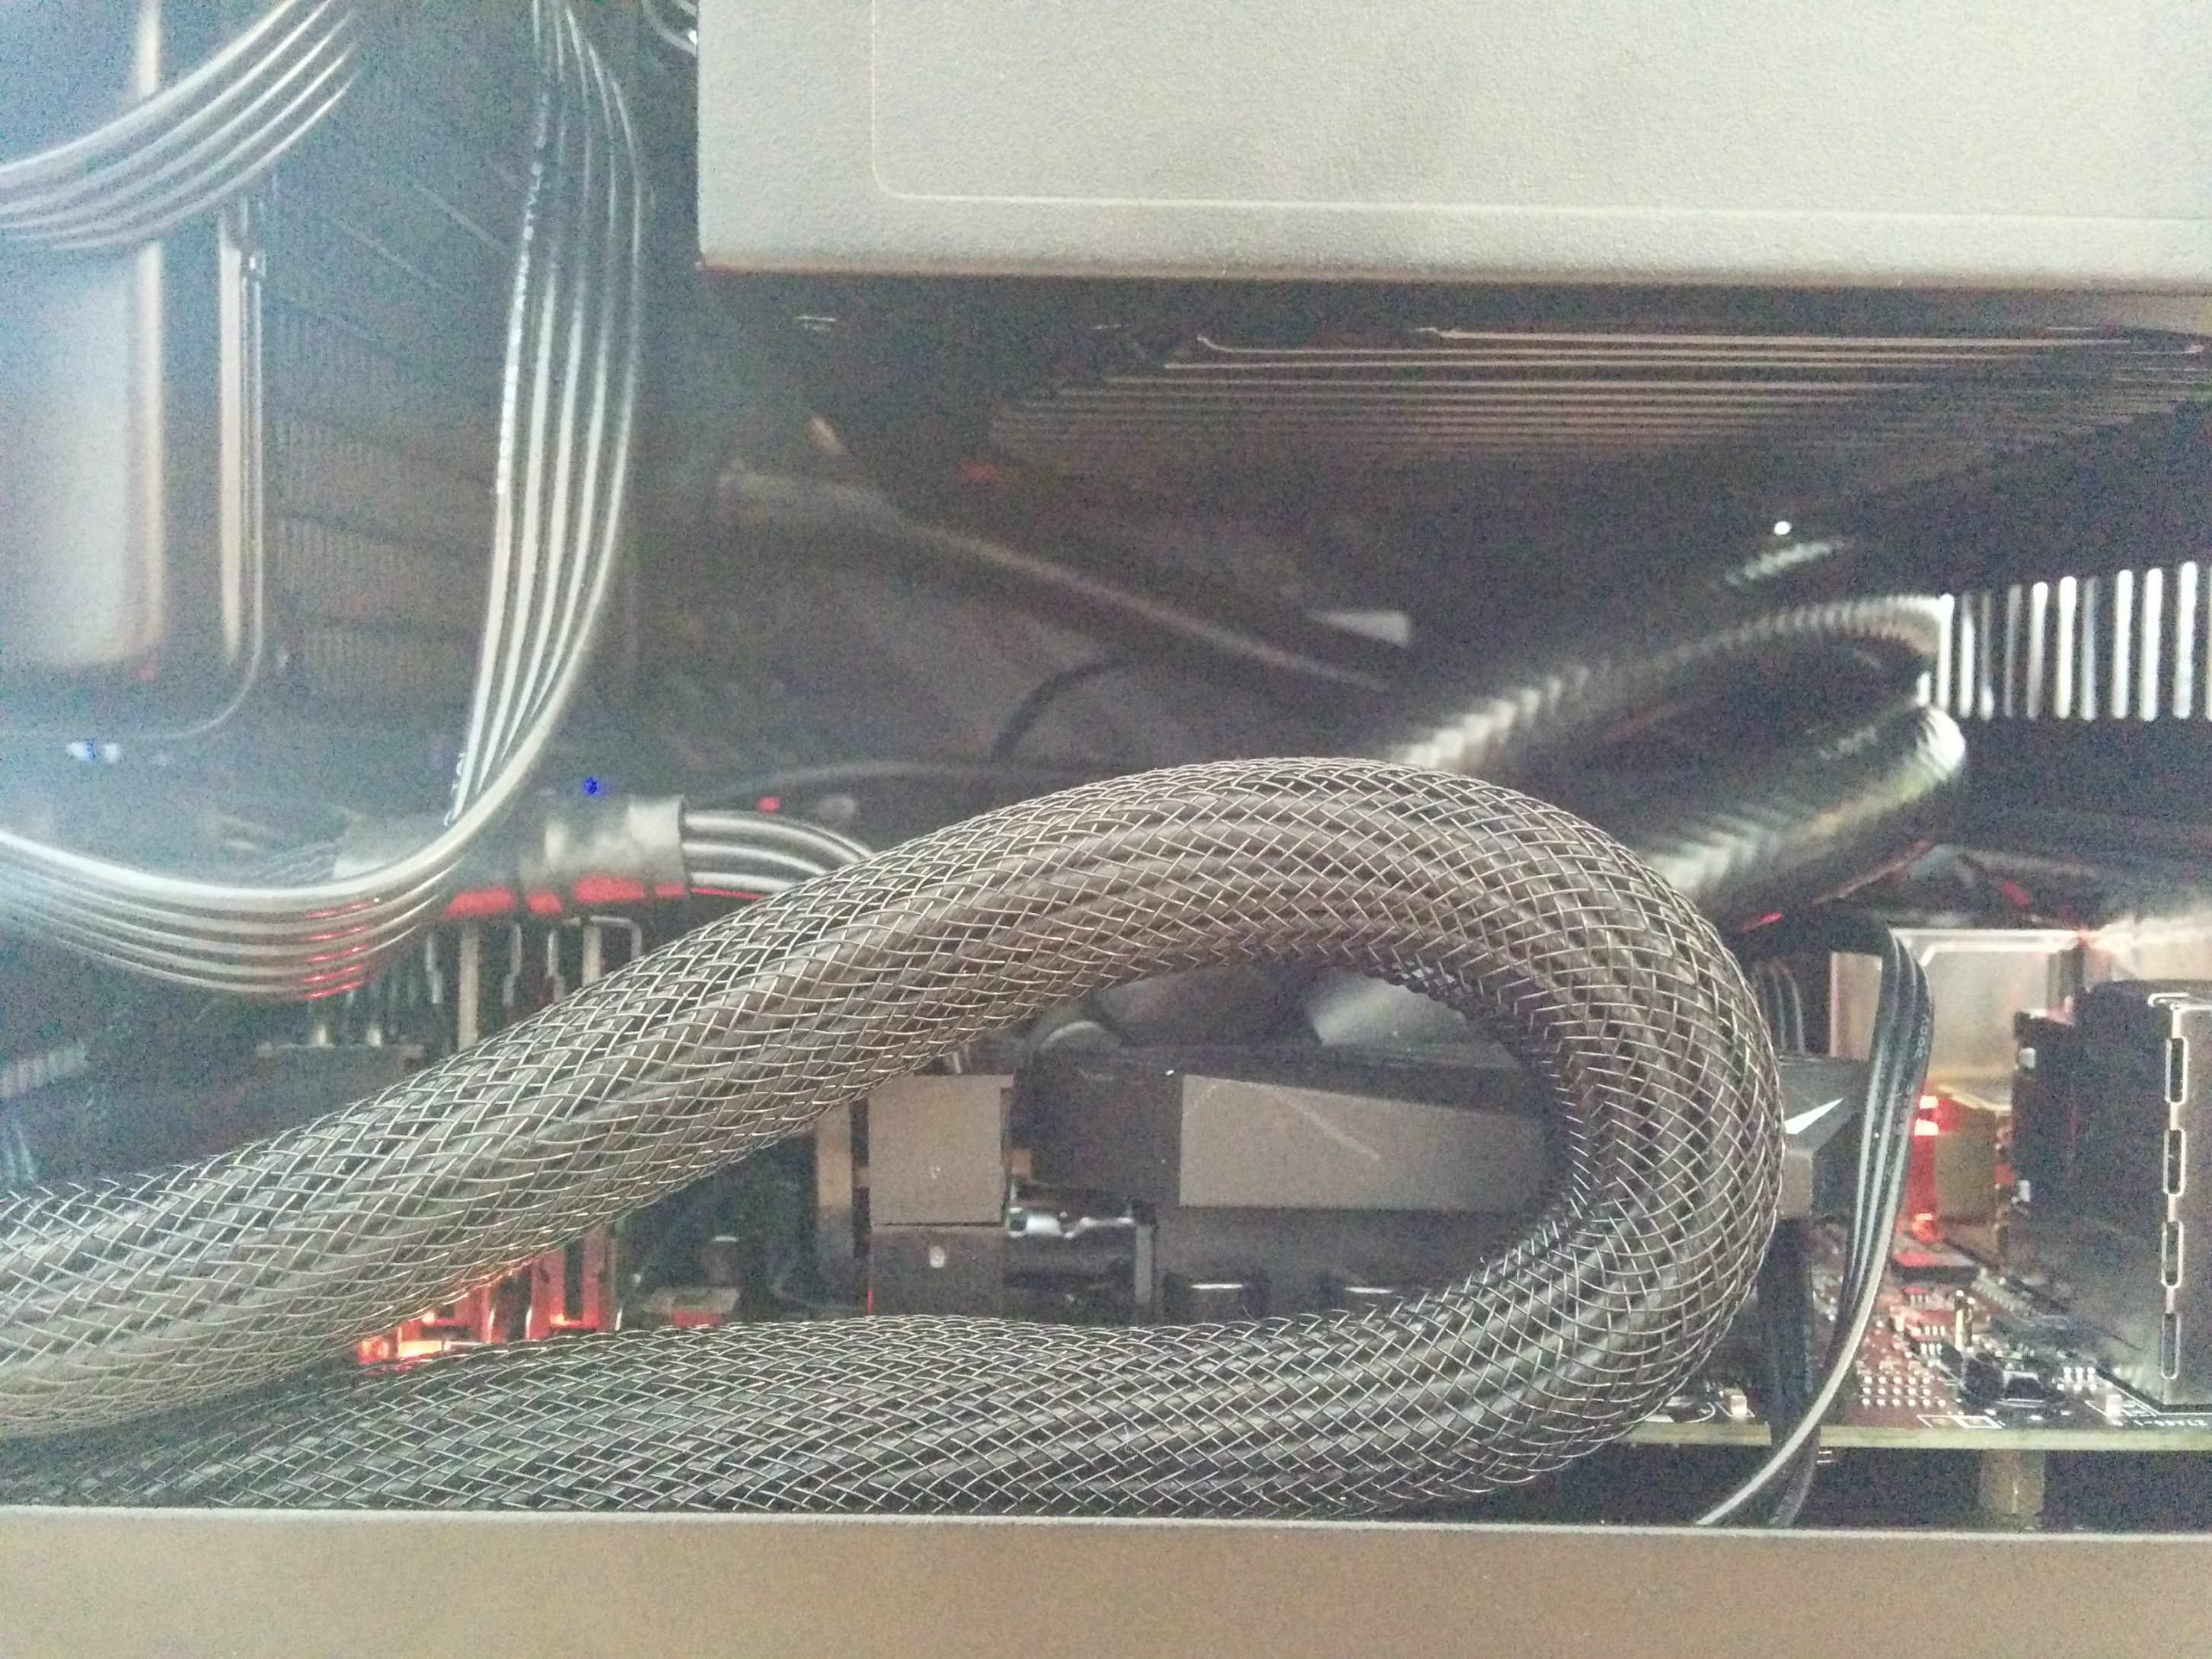 Cooler Master Elite 110 mini-ITX + Zotac GTX 1080 Mini - funktioniert\'s?